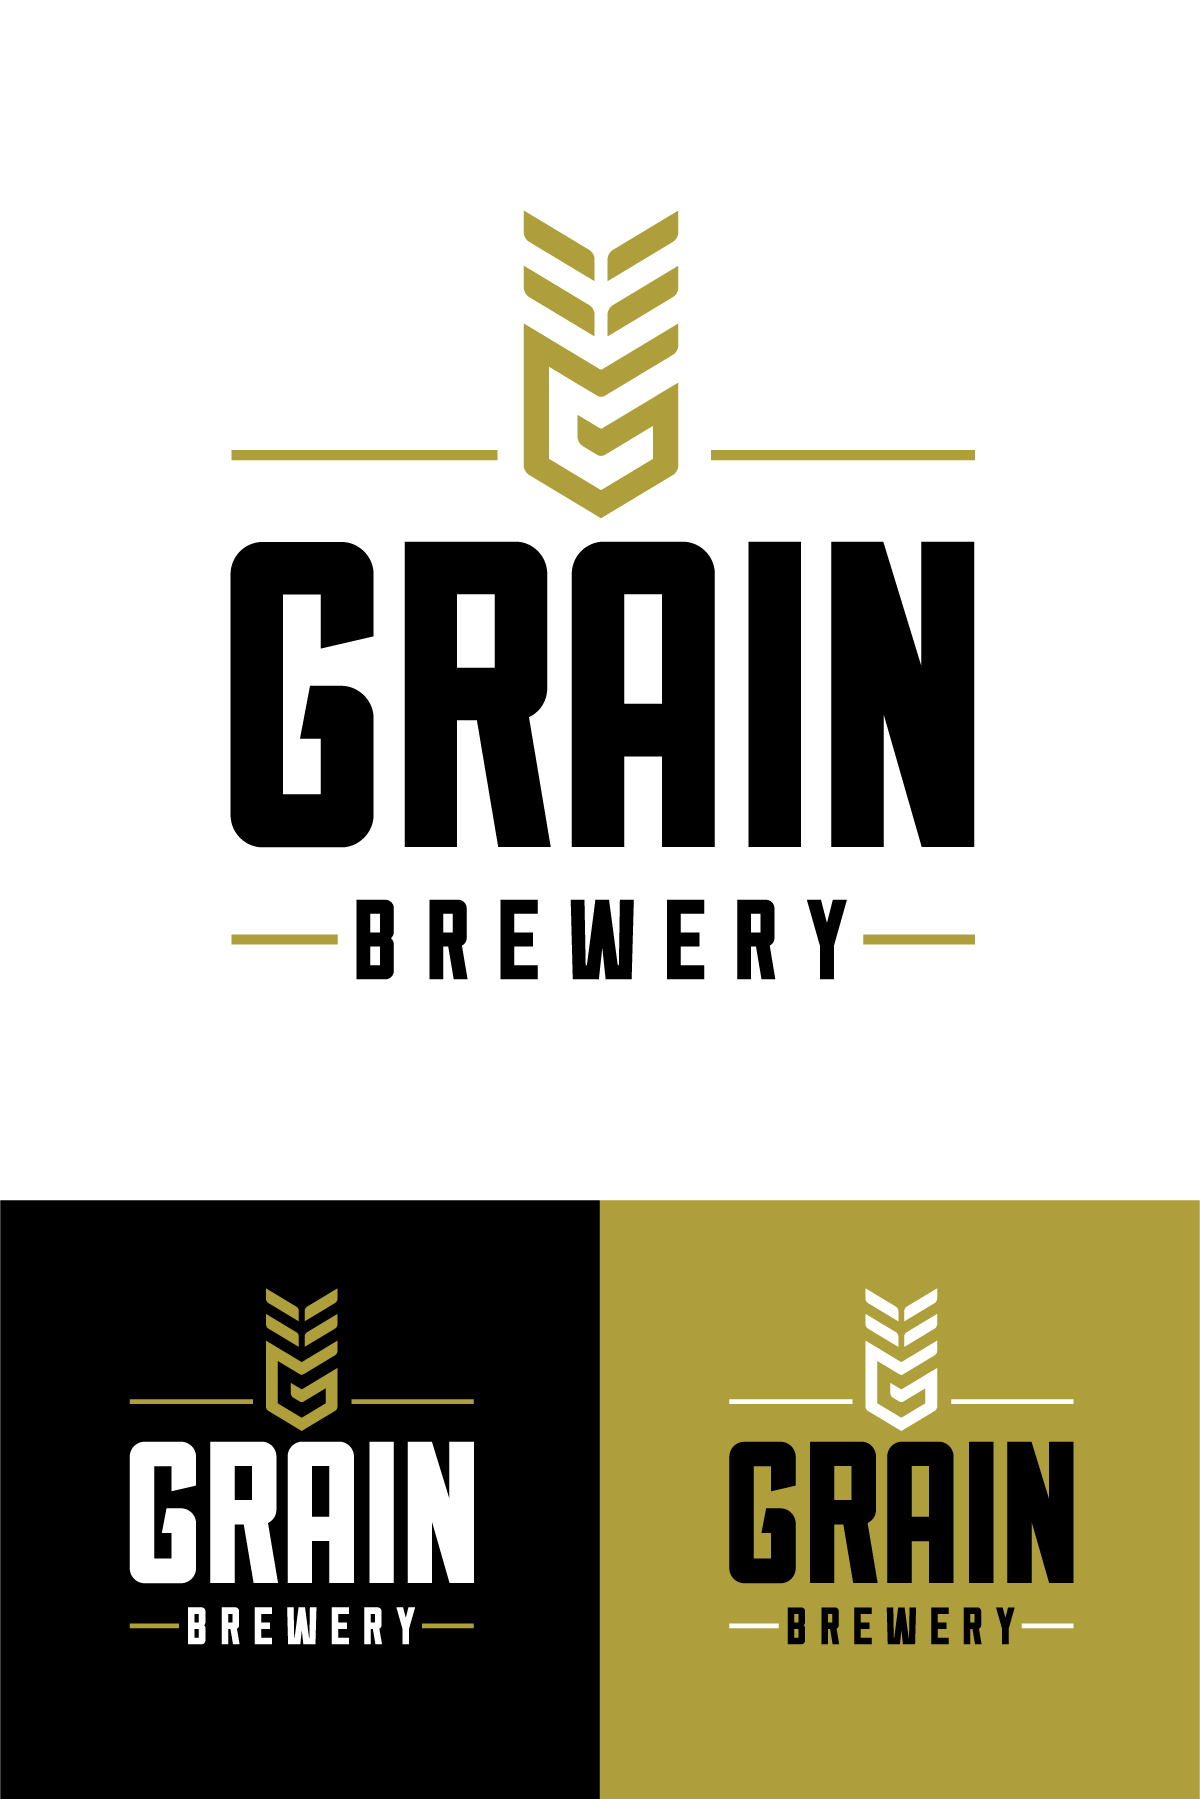 Grain Brewery Logo Design Brand Develeopment Branding Visual